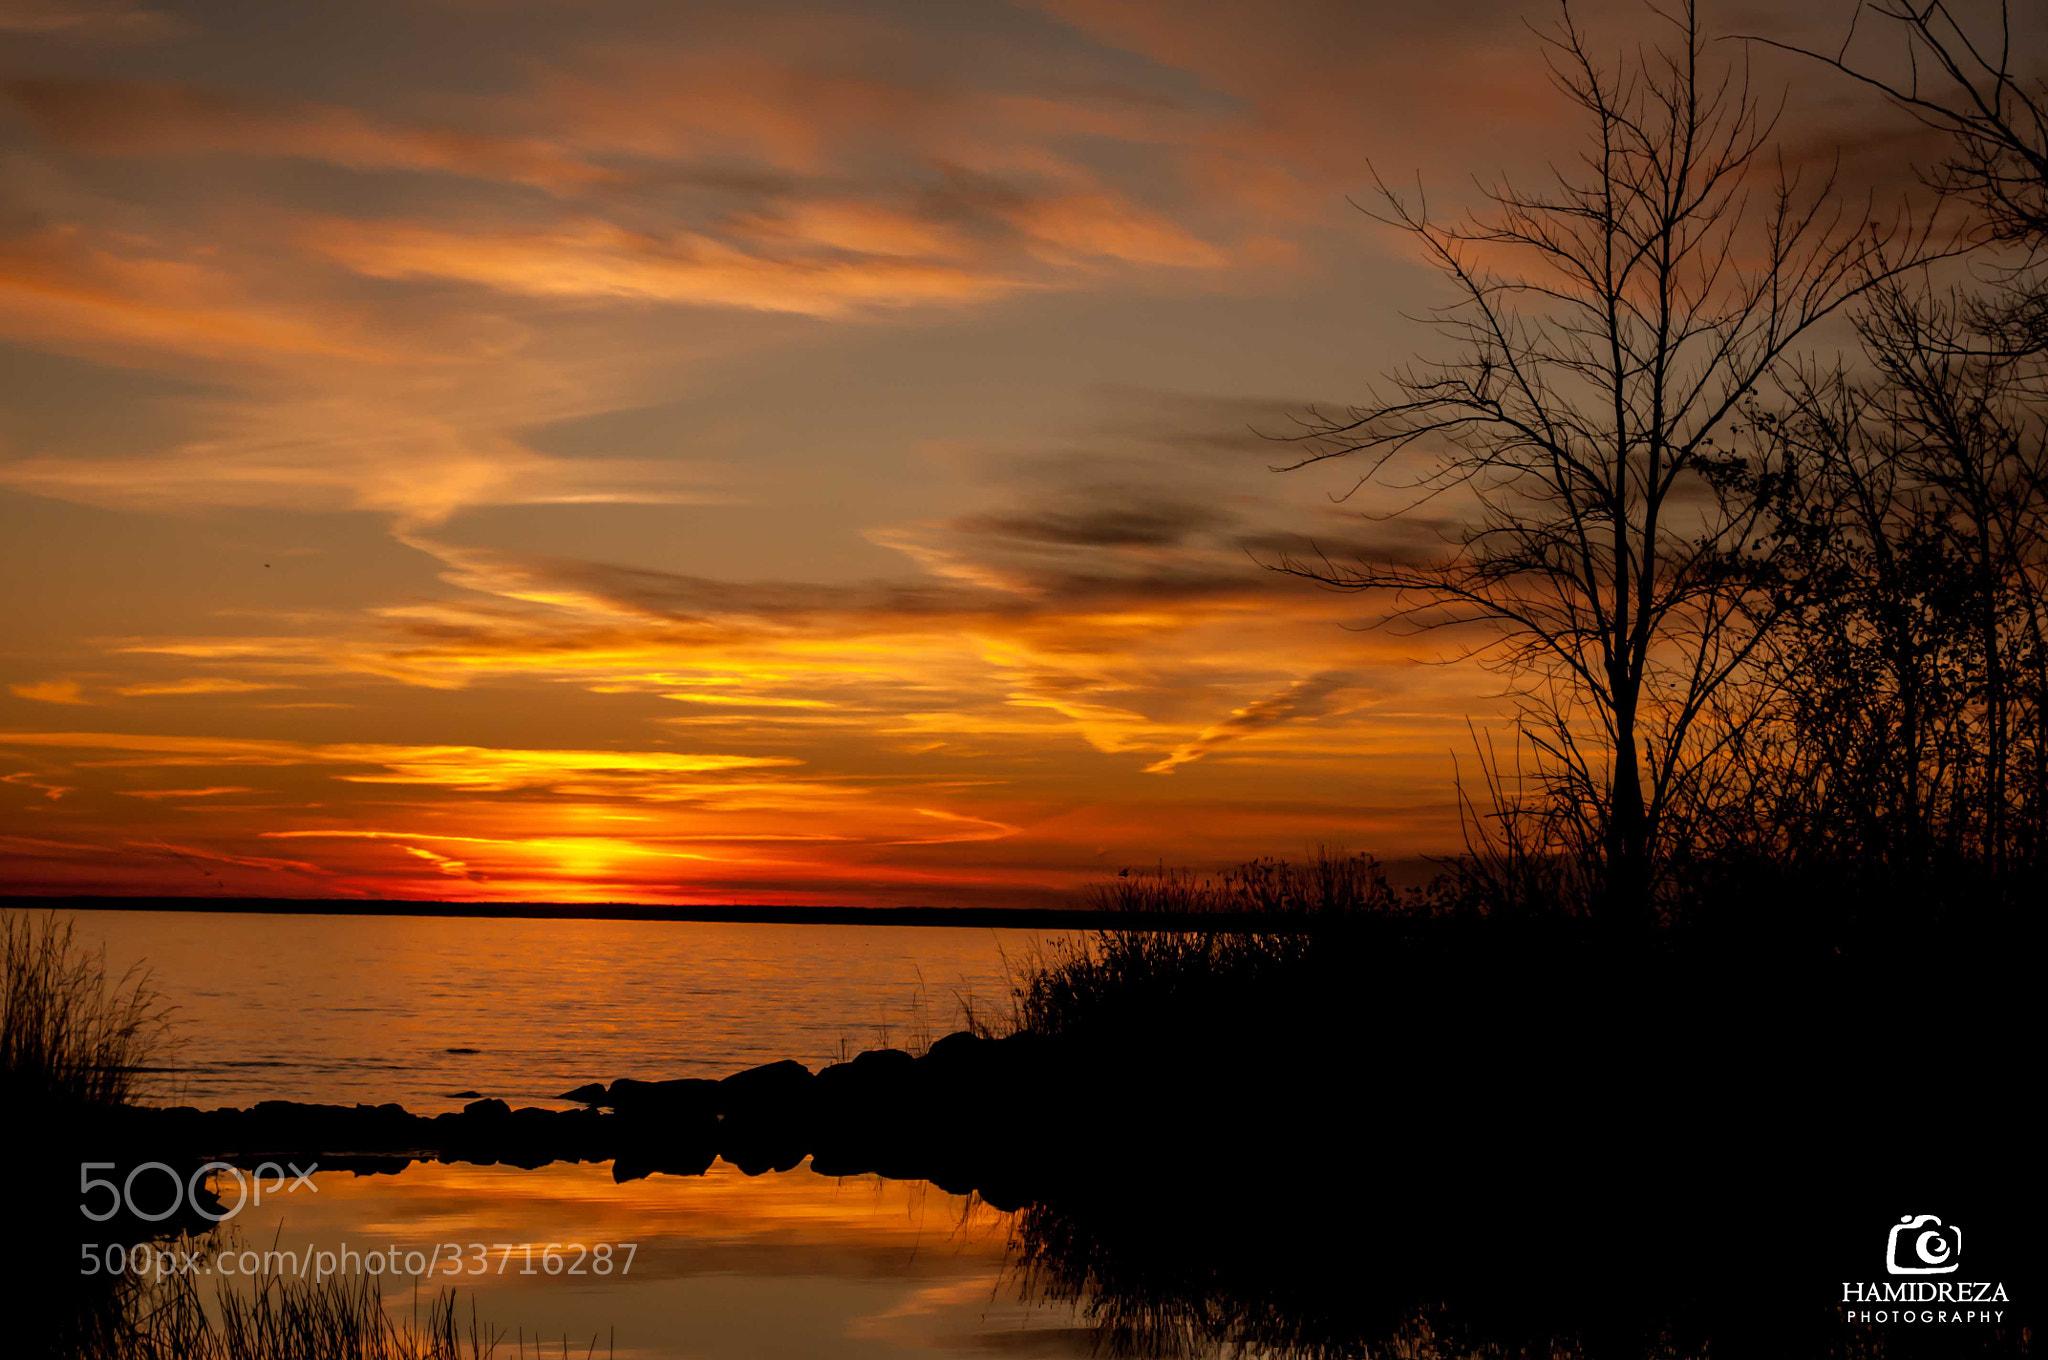 Photograph Sensational Sunset by Hamidreza Es on 500px